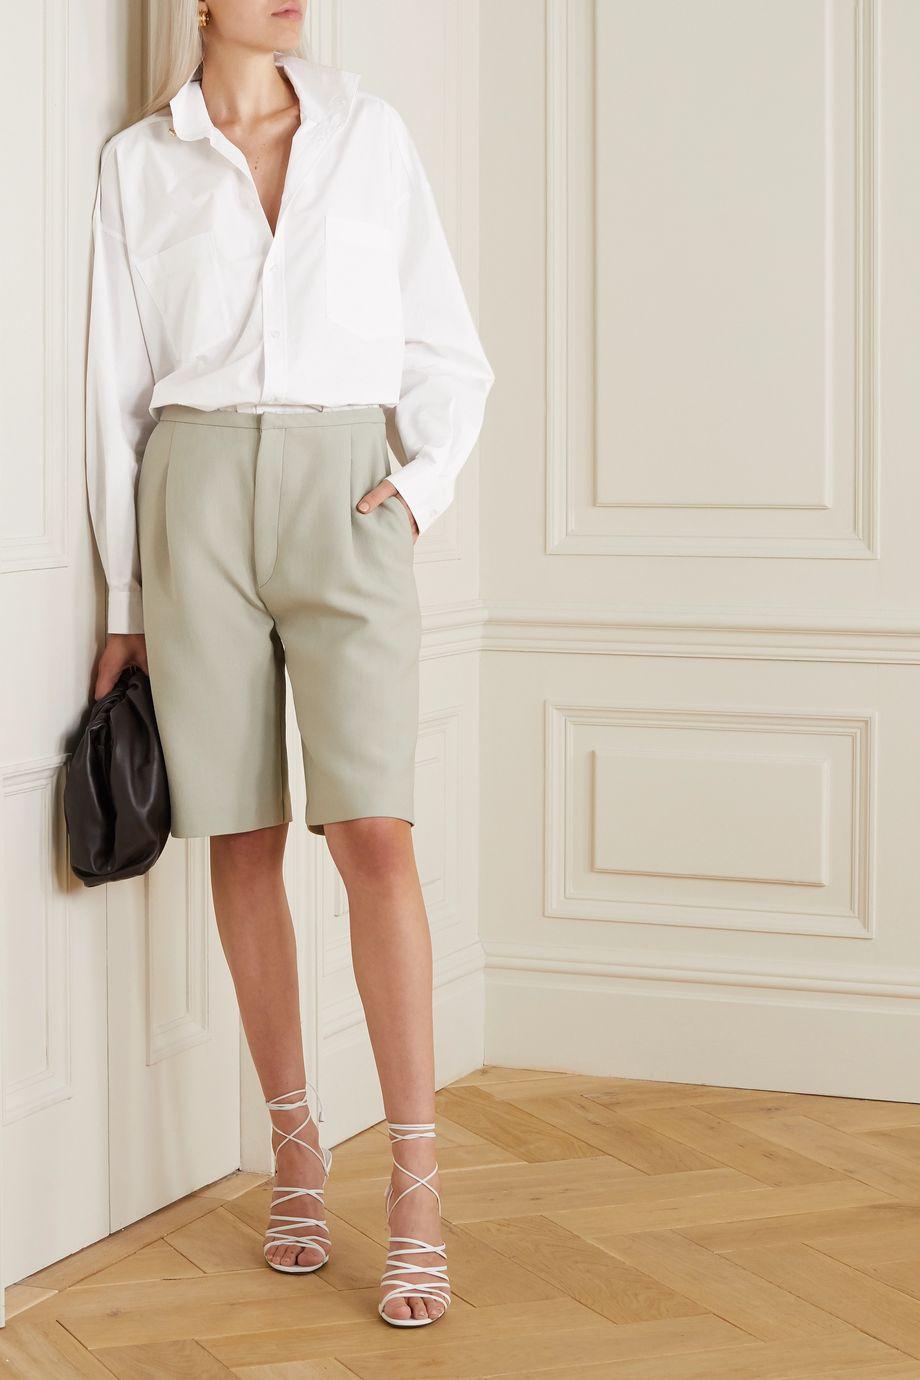 REMAIN Birger Christensen Robin 带缀饰有机纯棉府绸衬衫